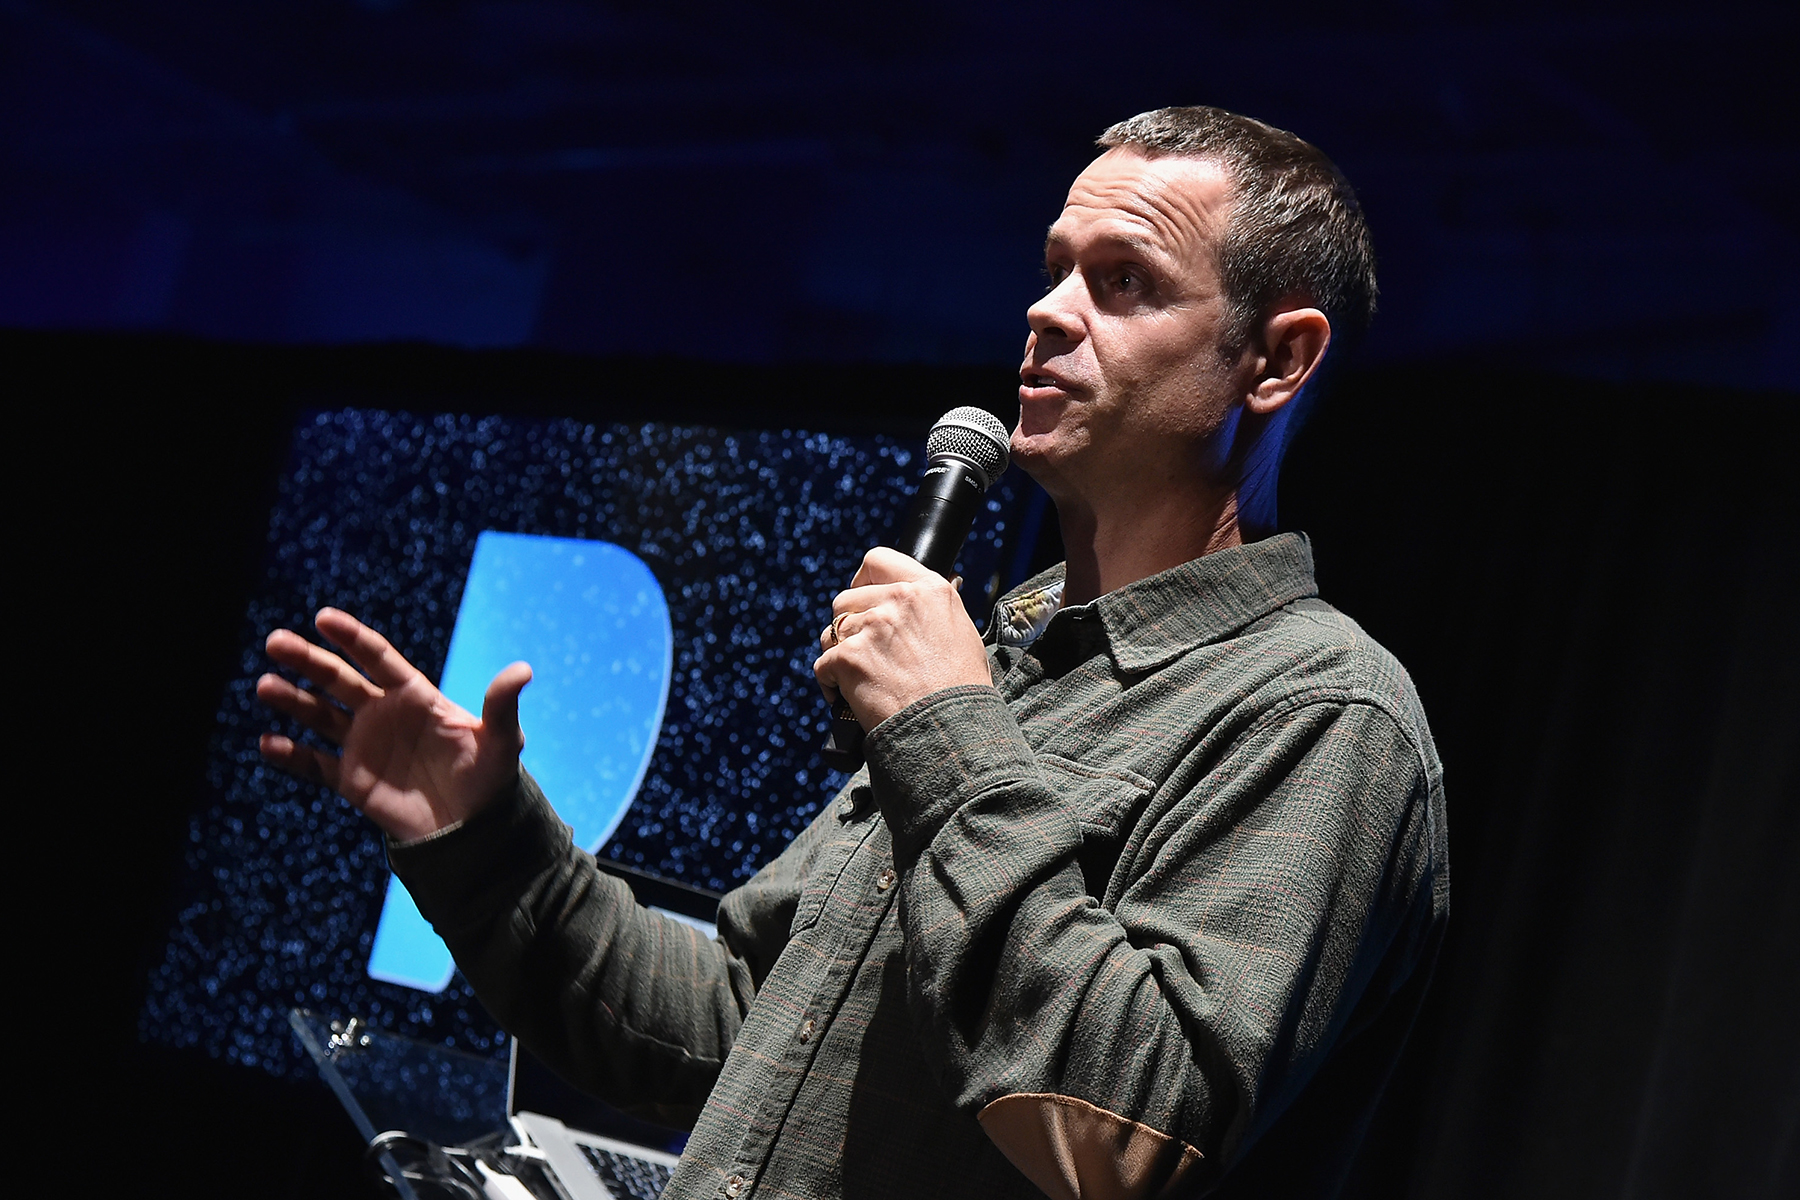 Internet marketing Pandora's Ex-CEO Tim Westergren Wants to (Finally) Make Artists Money